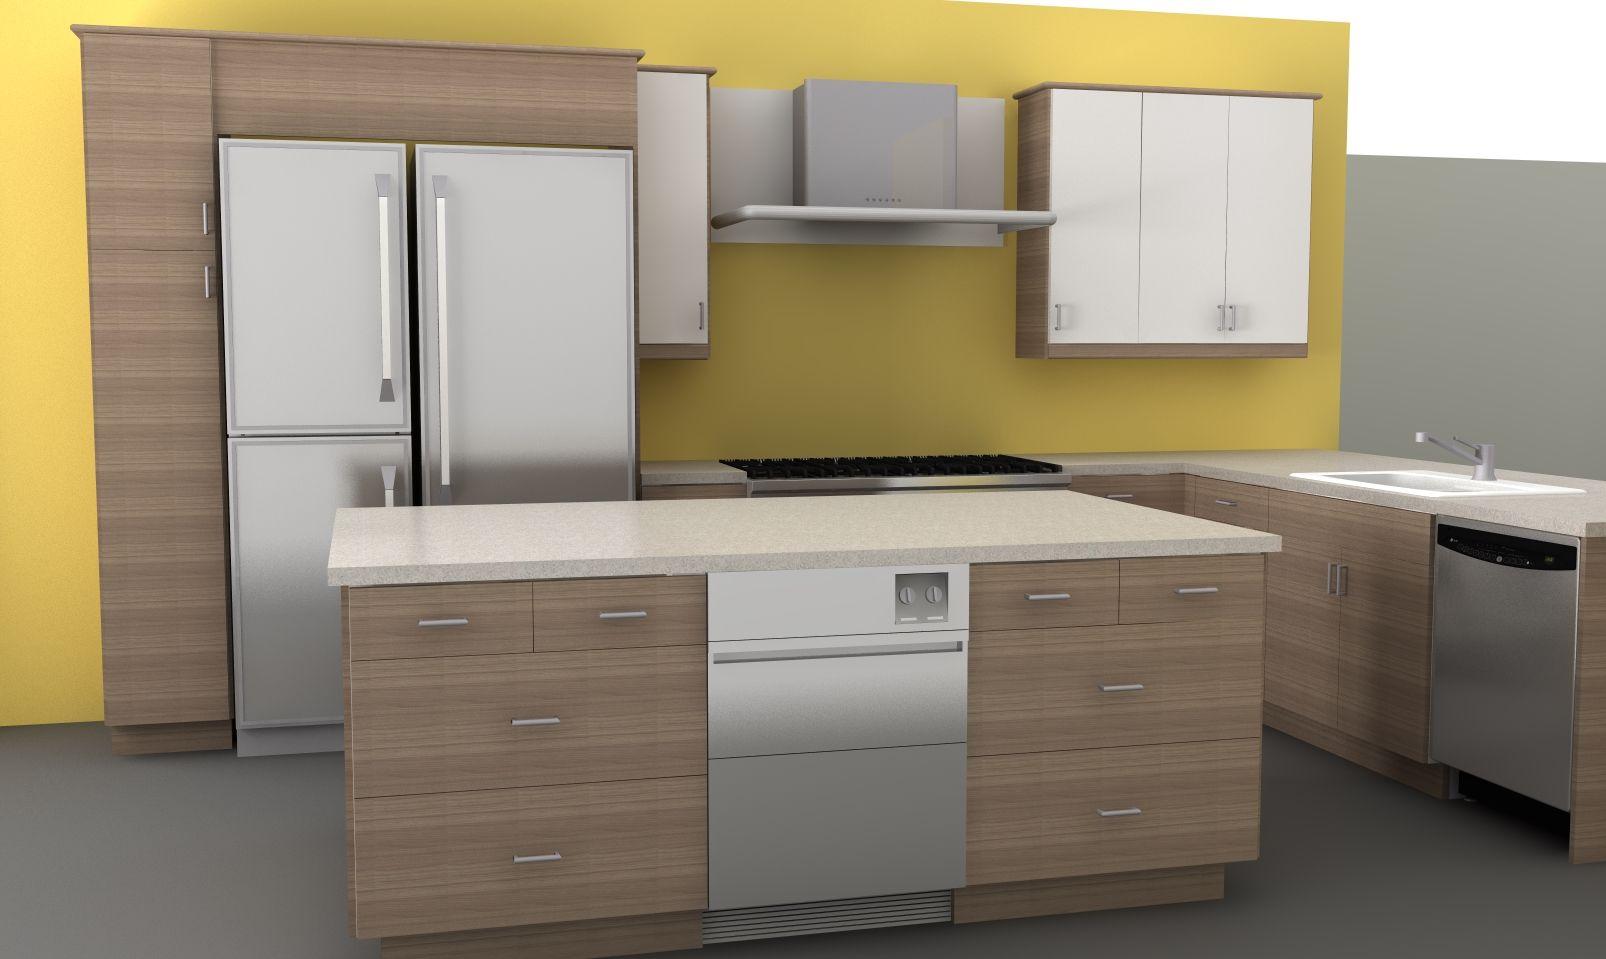 ikea door fronts for integrated appliances kitchen pinterest